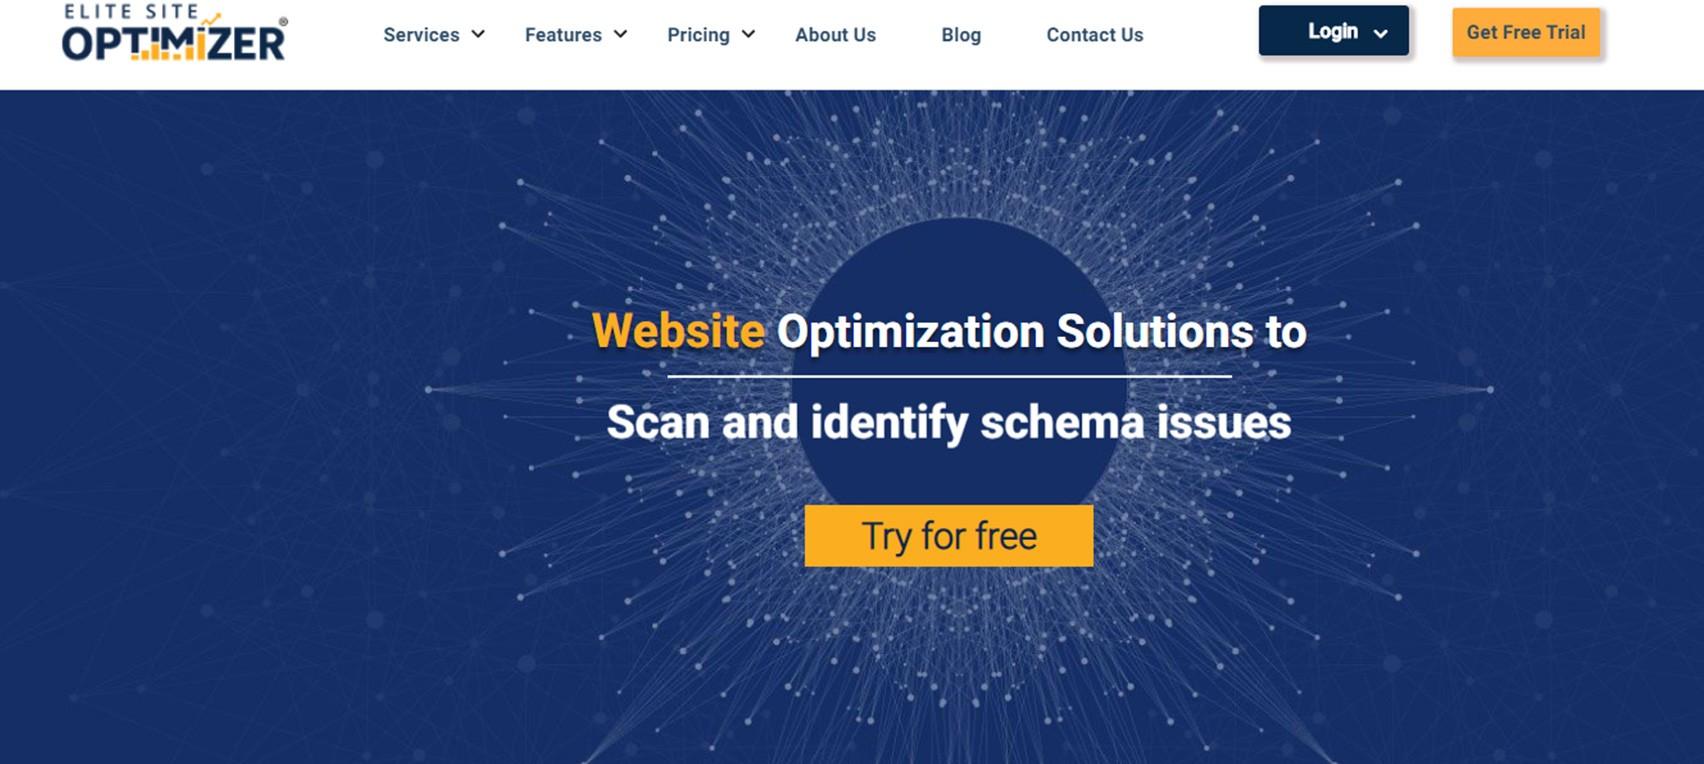 elite site optimizer-home page